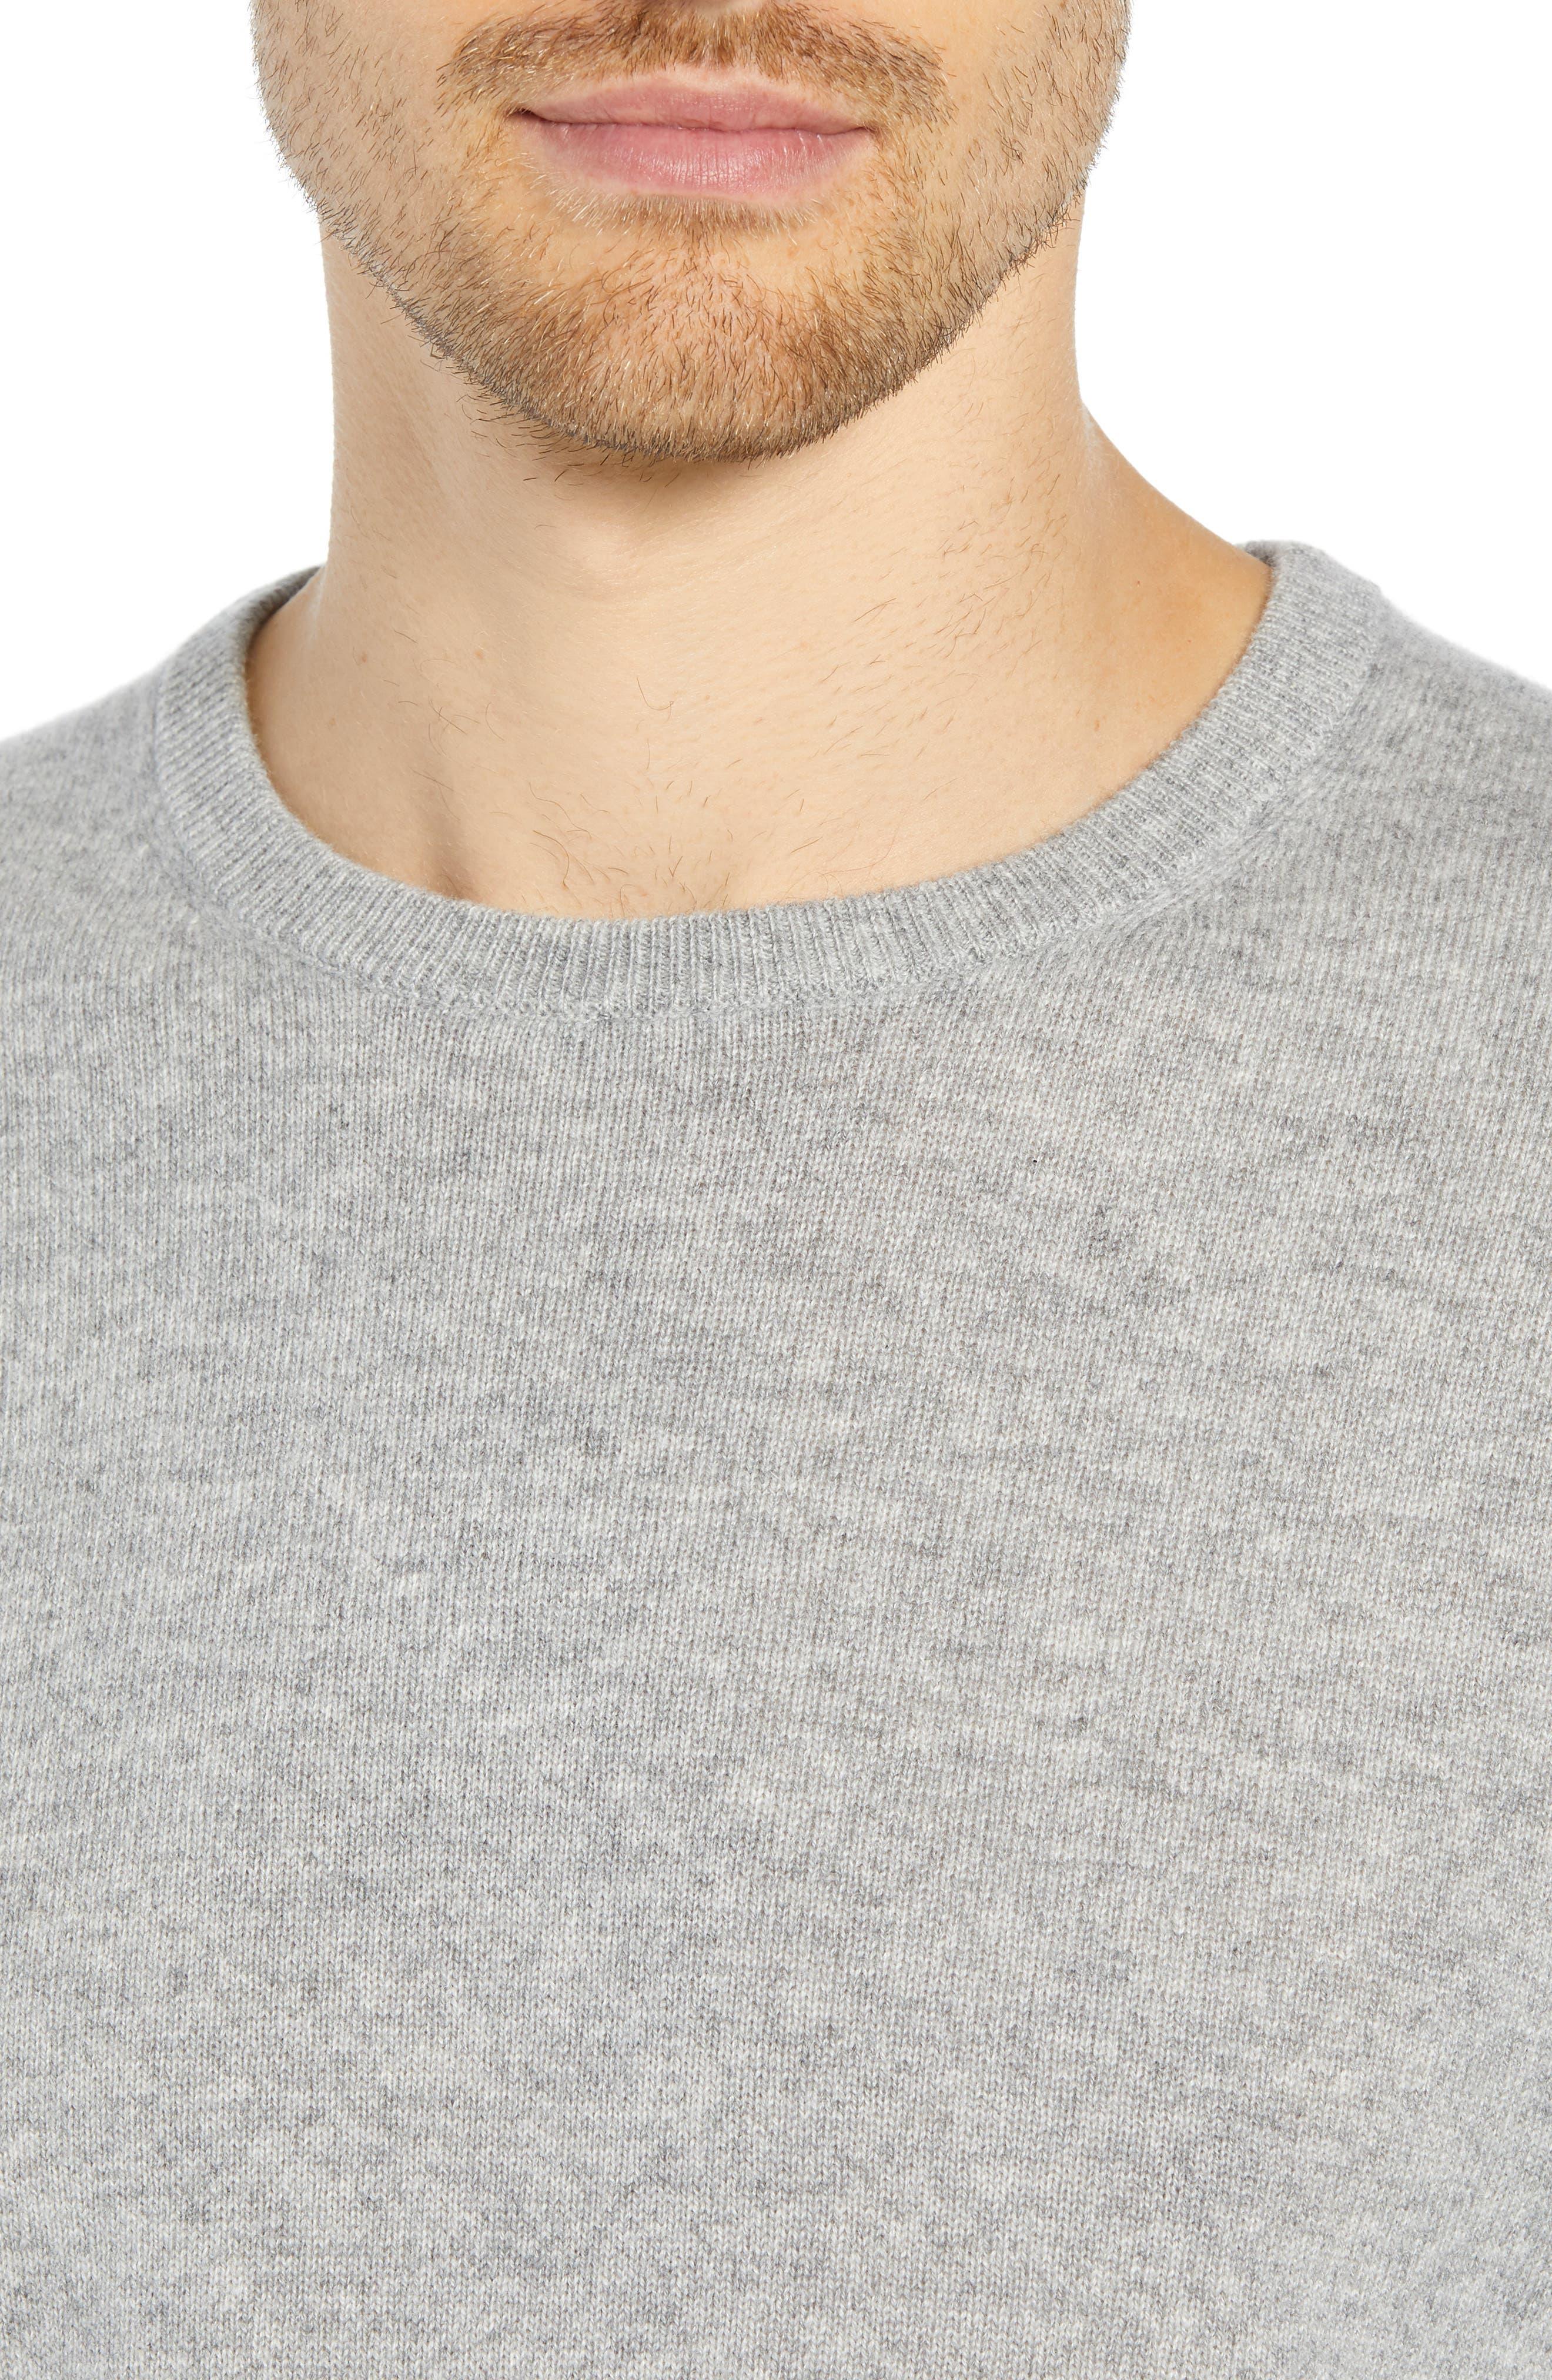 Everyday Cashmere Regular Fit Crewneck Sweater,                             Alternate thumbnail 4, color,                             HEATHER GREY